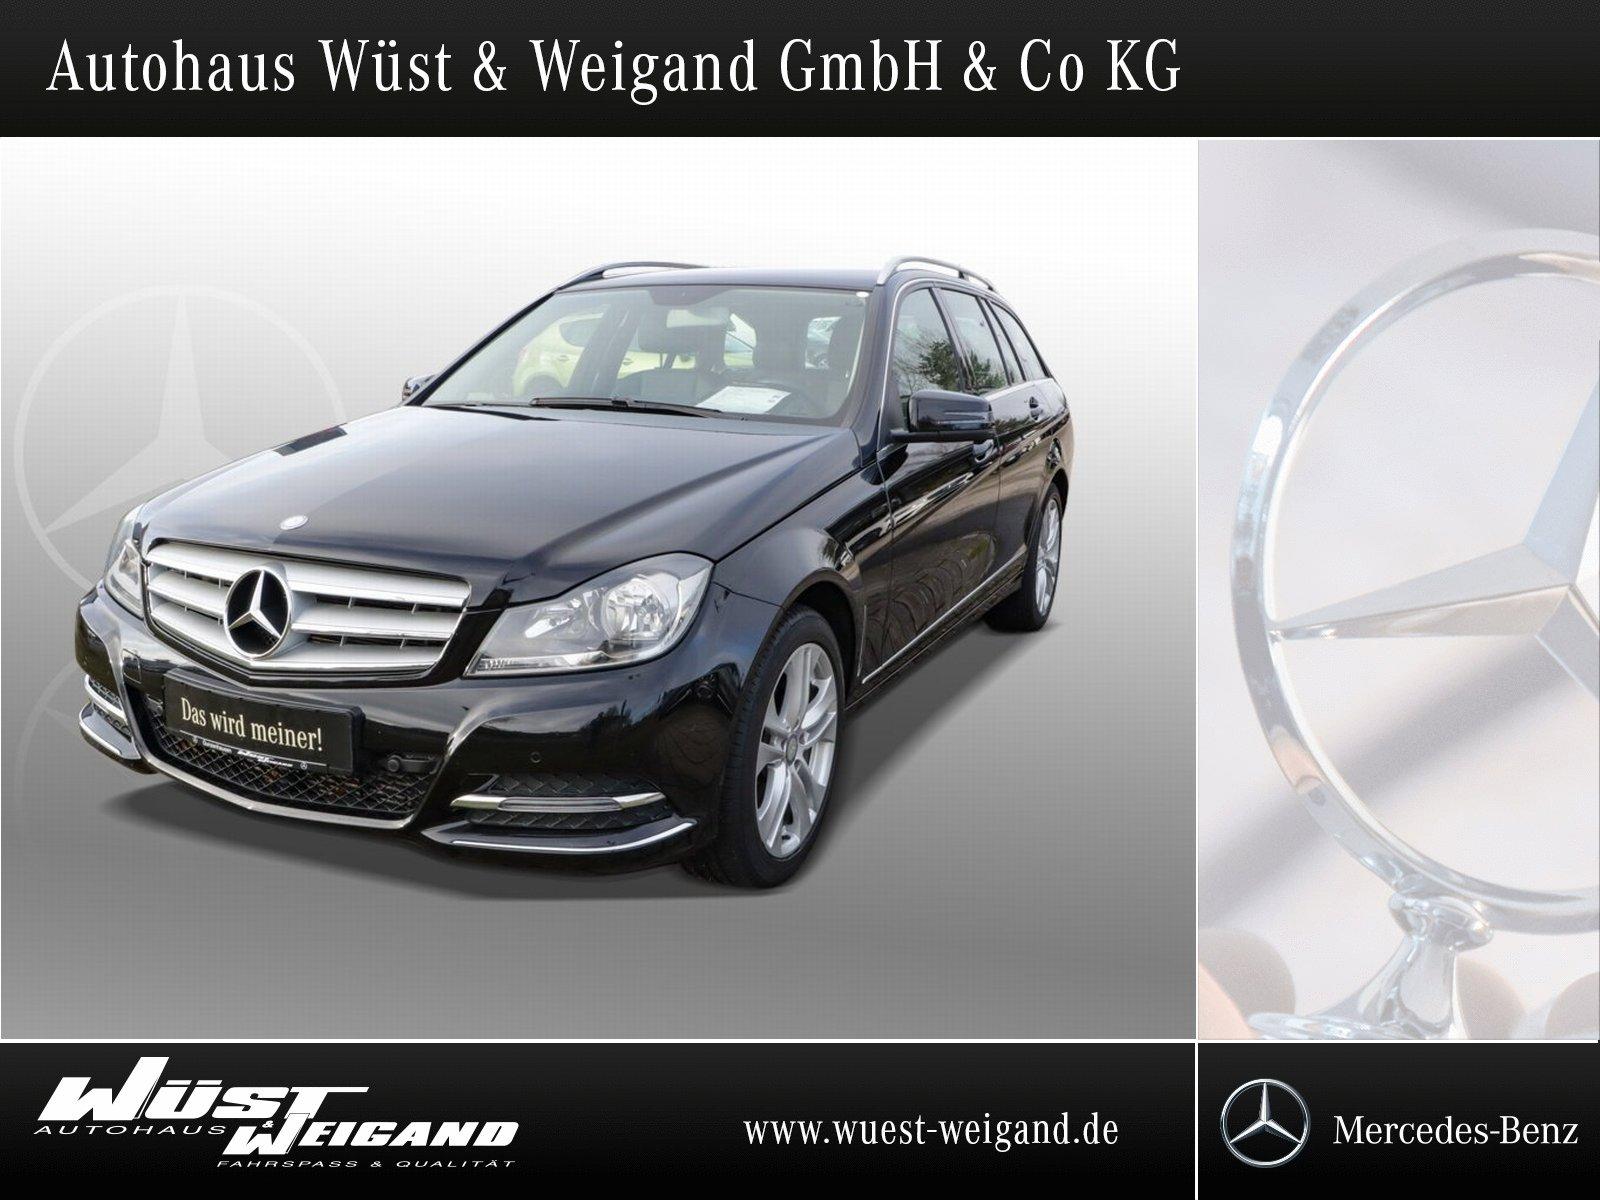 Mercedes-Benz C 180 CGI Avantgarde+Navi+SHZ+AHK+PTS+Bluetooth, Jahr 2014, Benzin